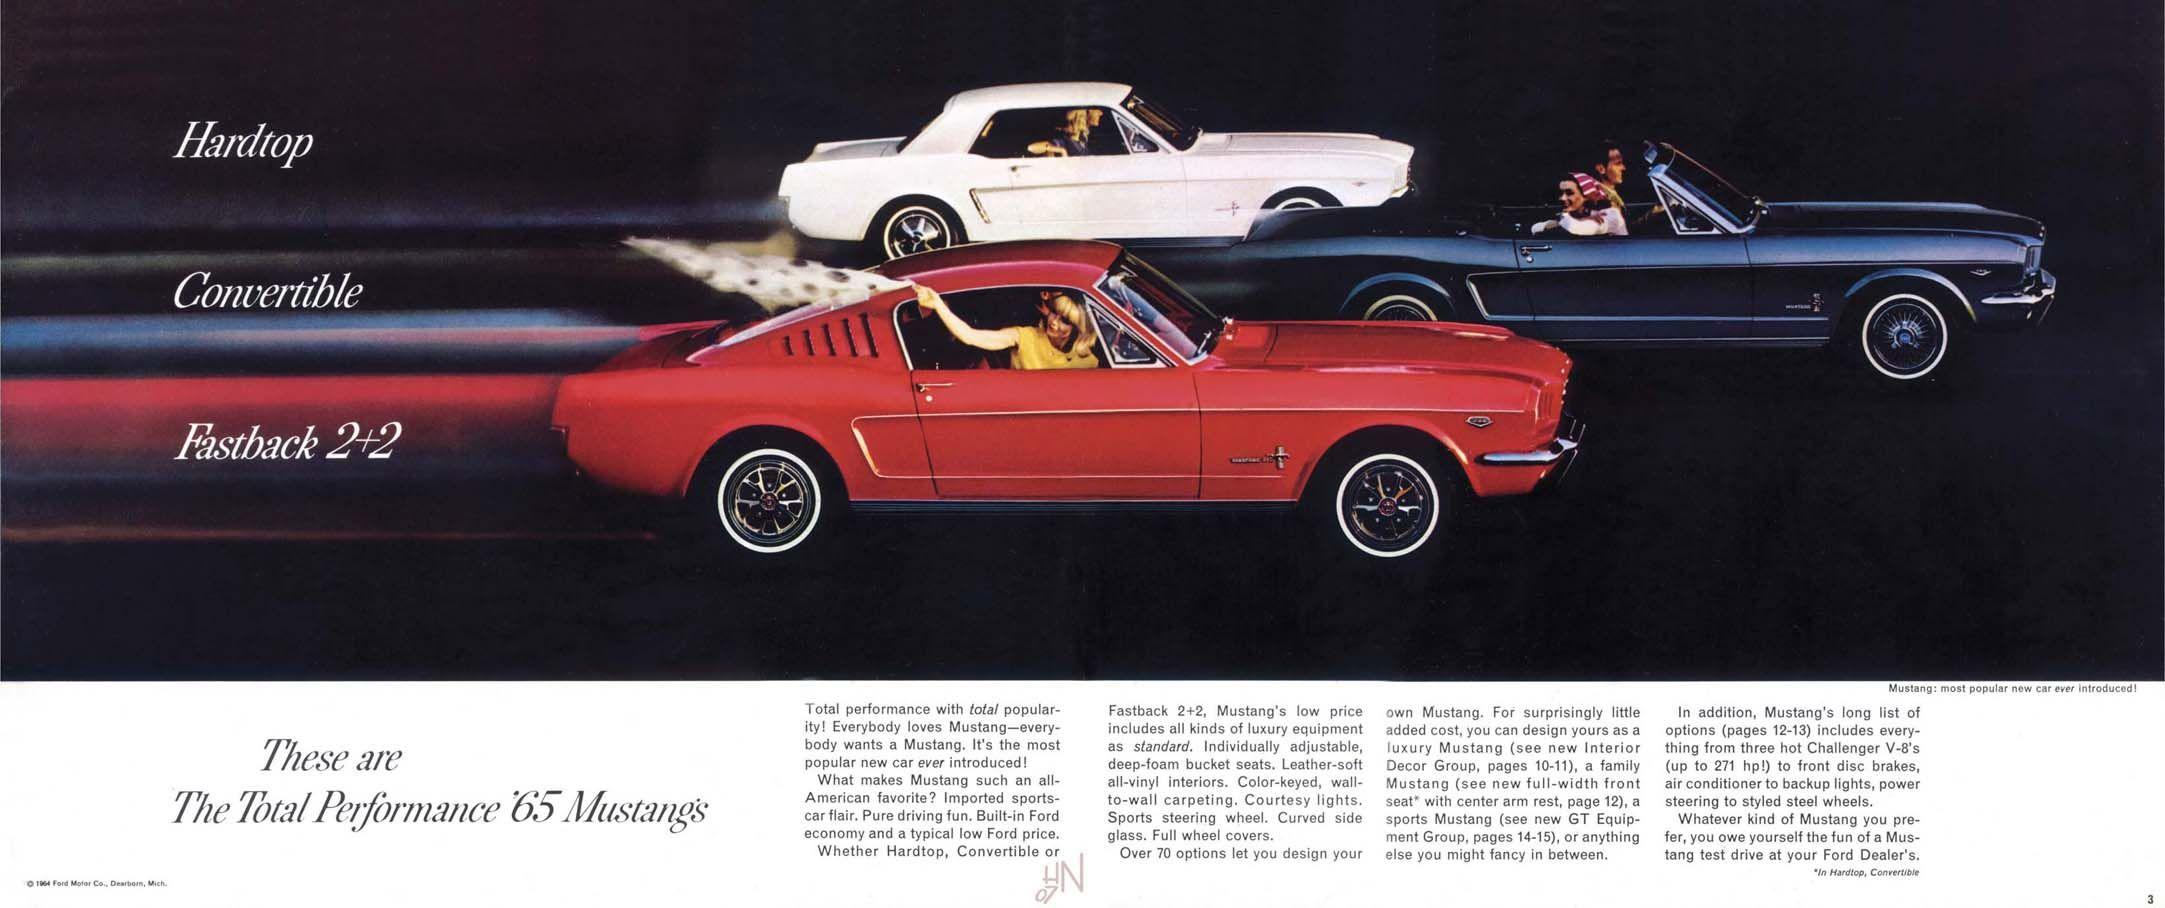 1965 Ford Mustang Ad Ford Mustang 1965 Ford Mustang Mustang